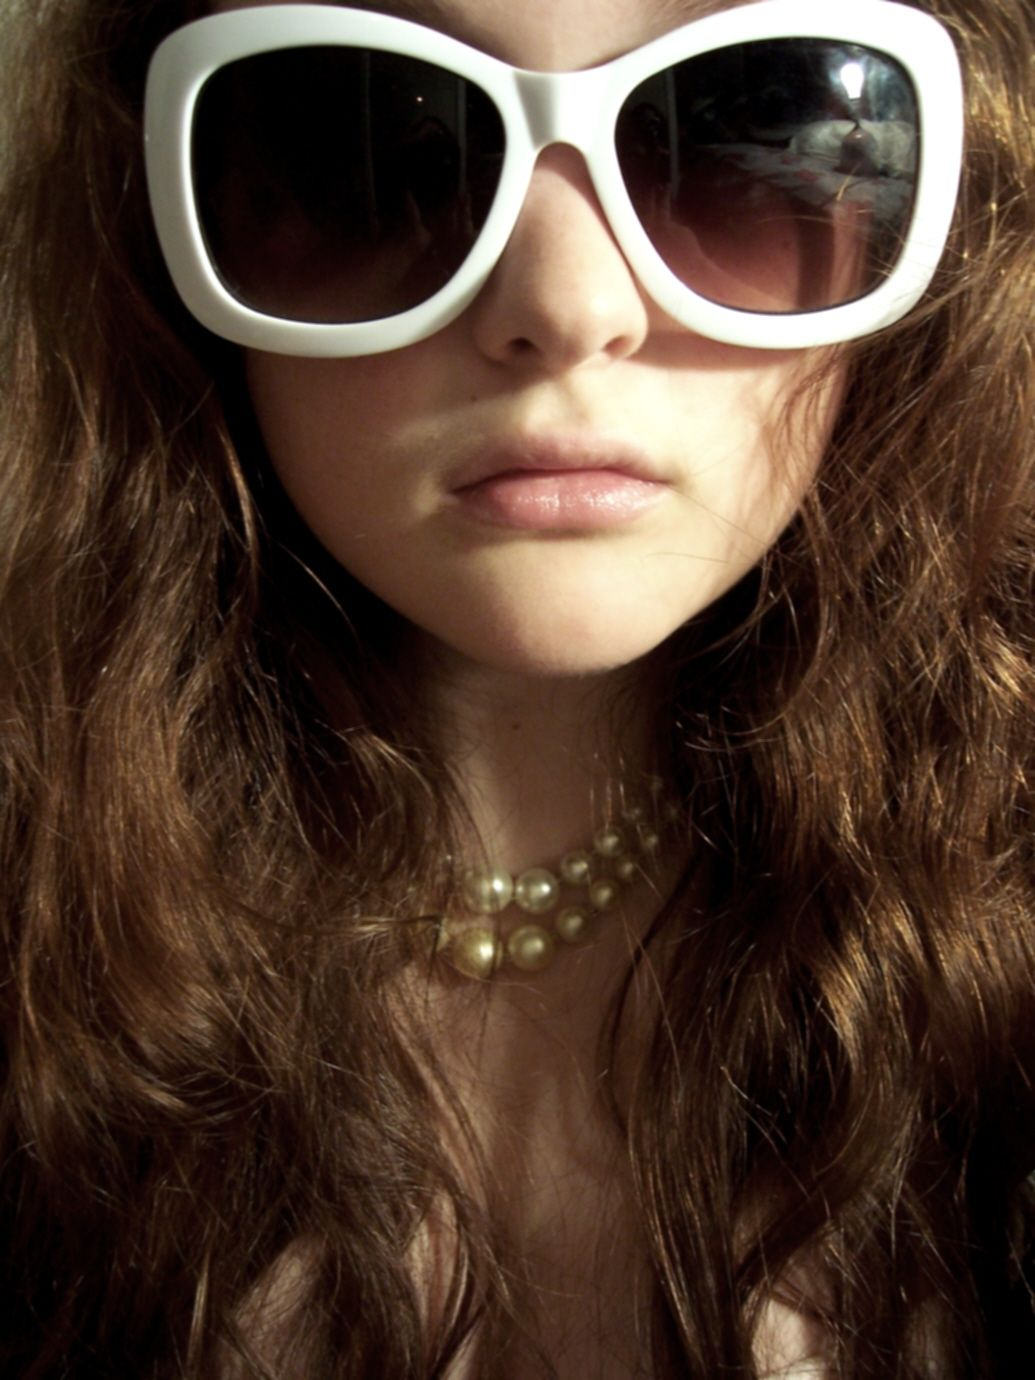 32f68c4fc16eb Big sunglasses. Big hair. by Unionhoney.deviantart.com on  deviantART